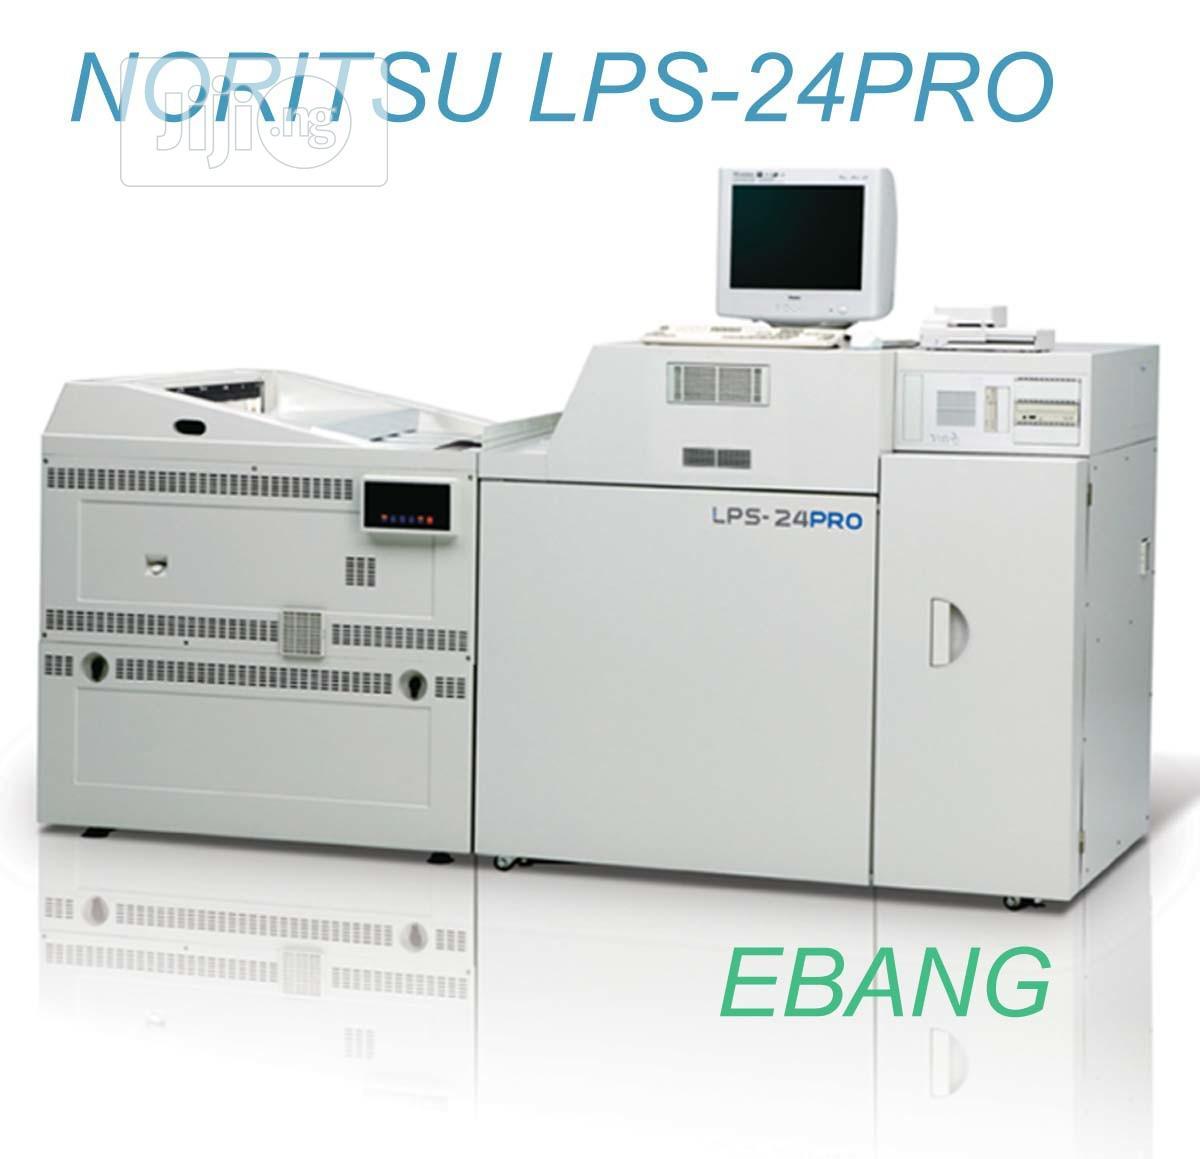 Noritsu LPS - 24 Pro